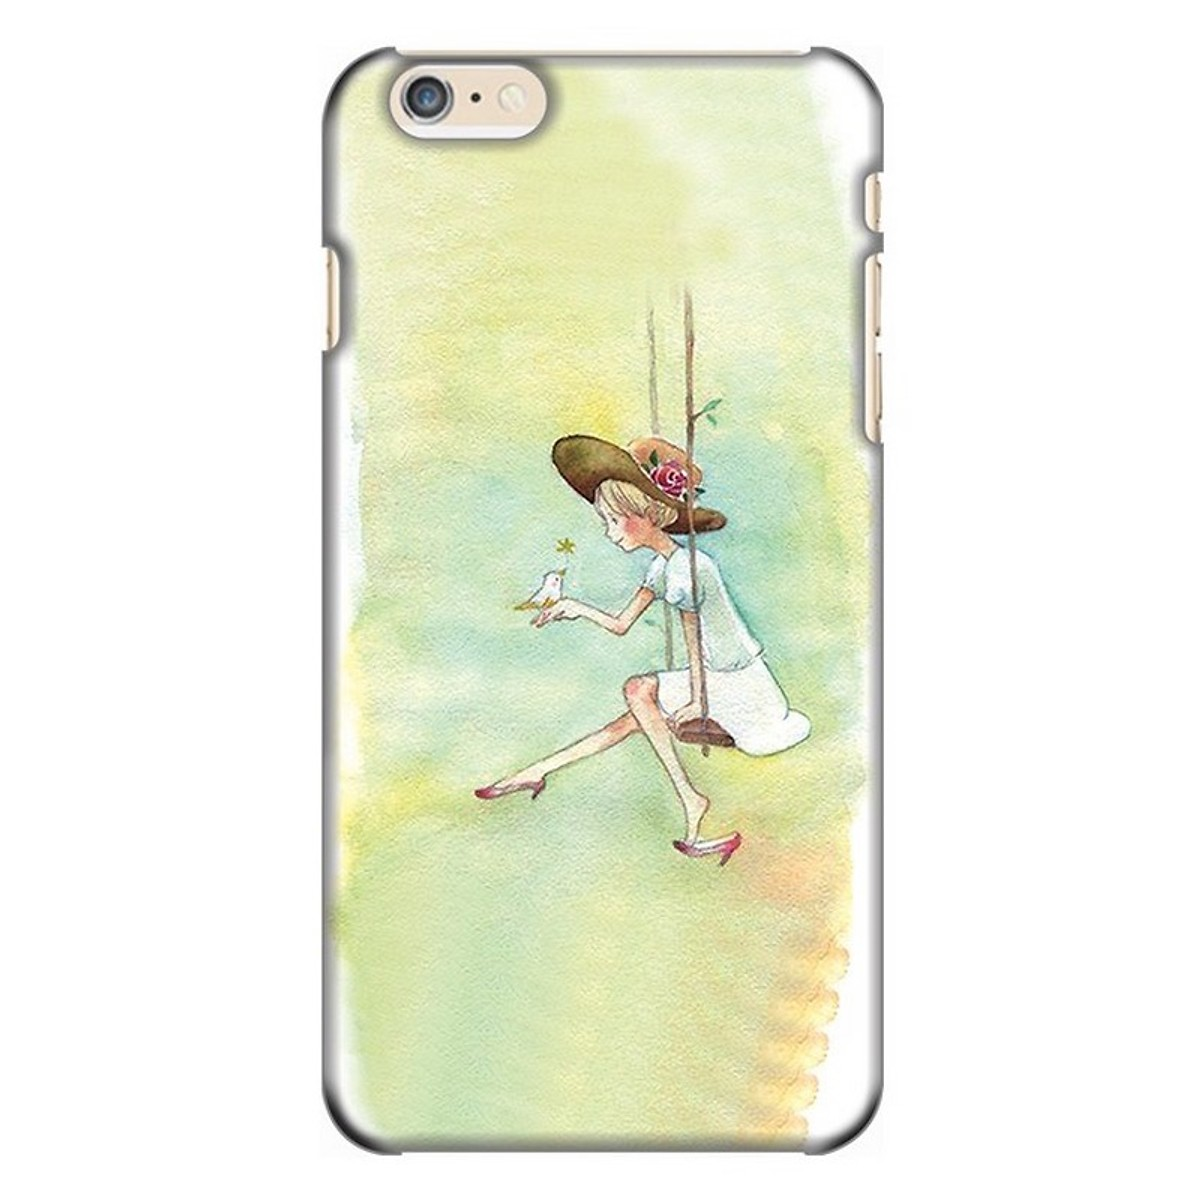 Ốp Lưng Cho iPhone 6 Plus - Mẫu 71